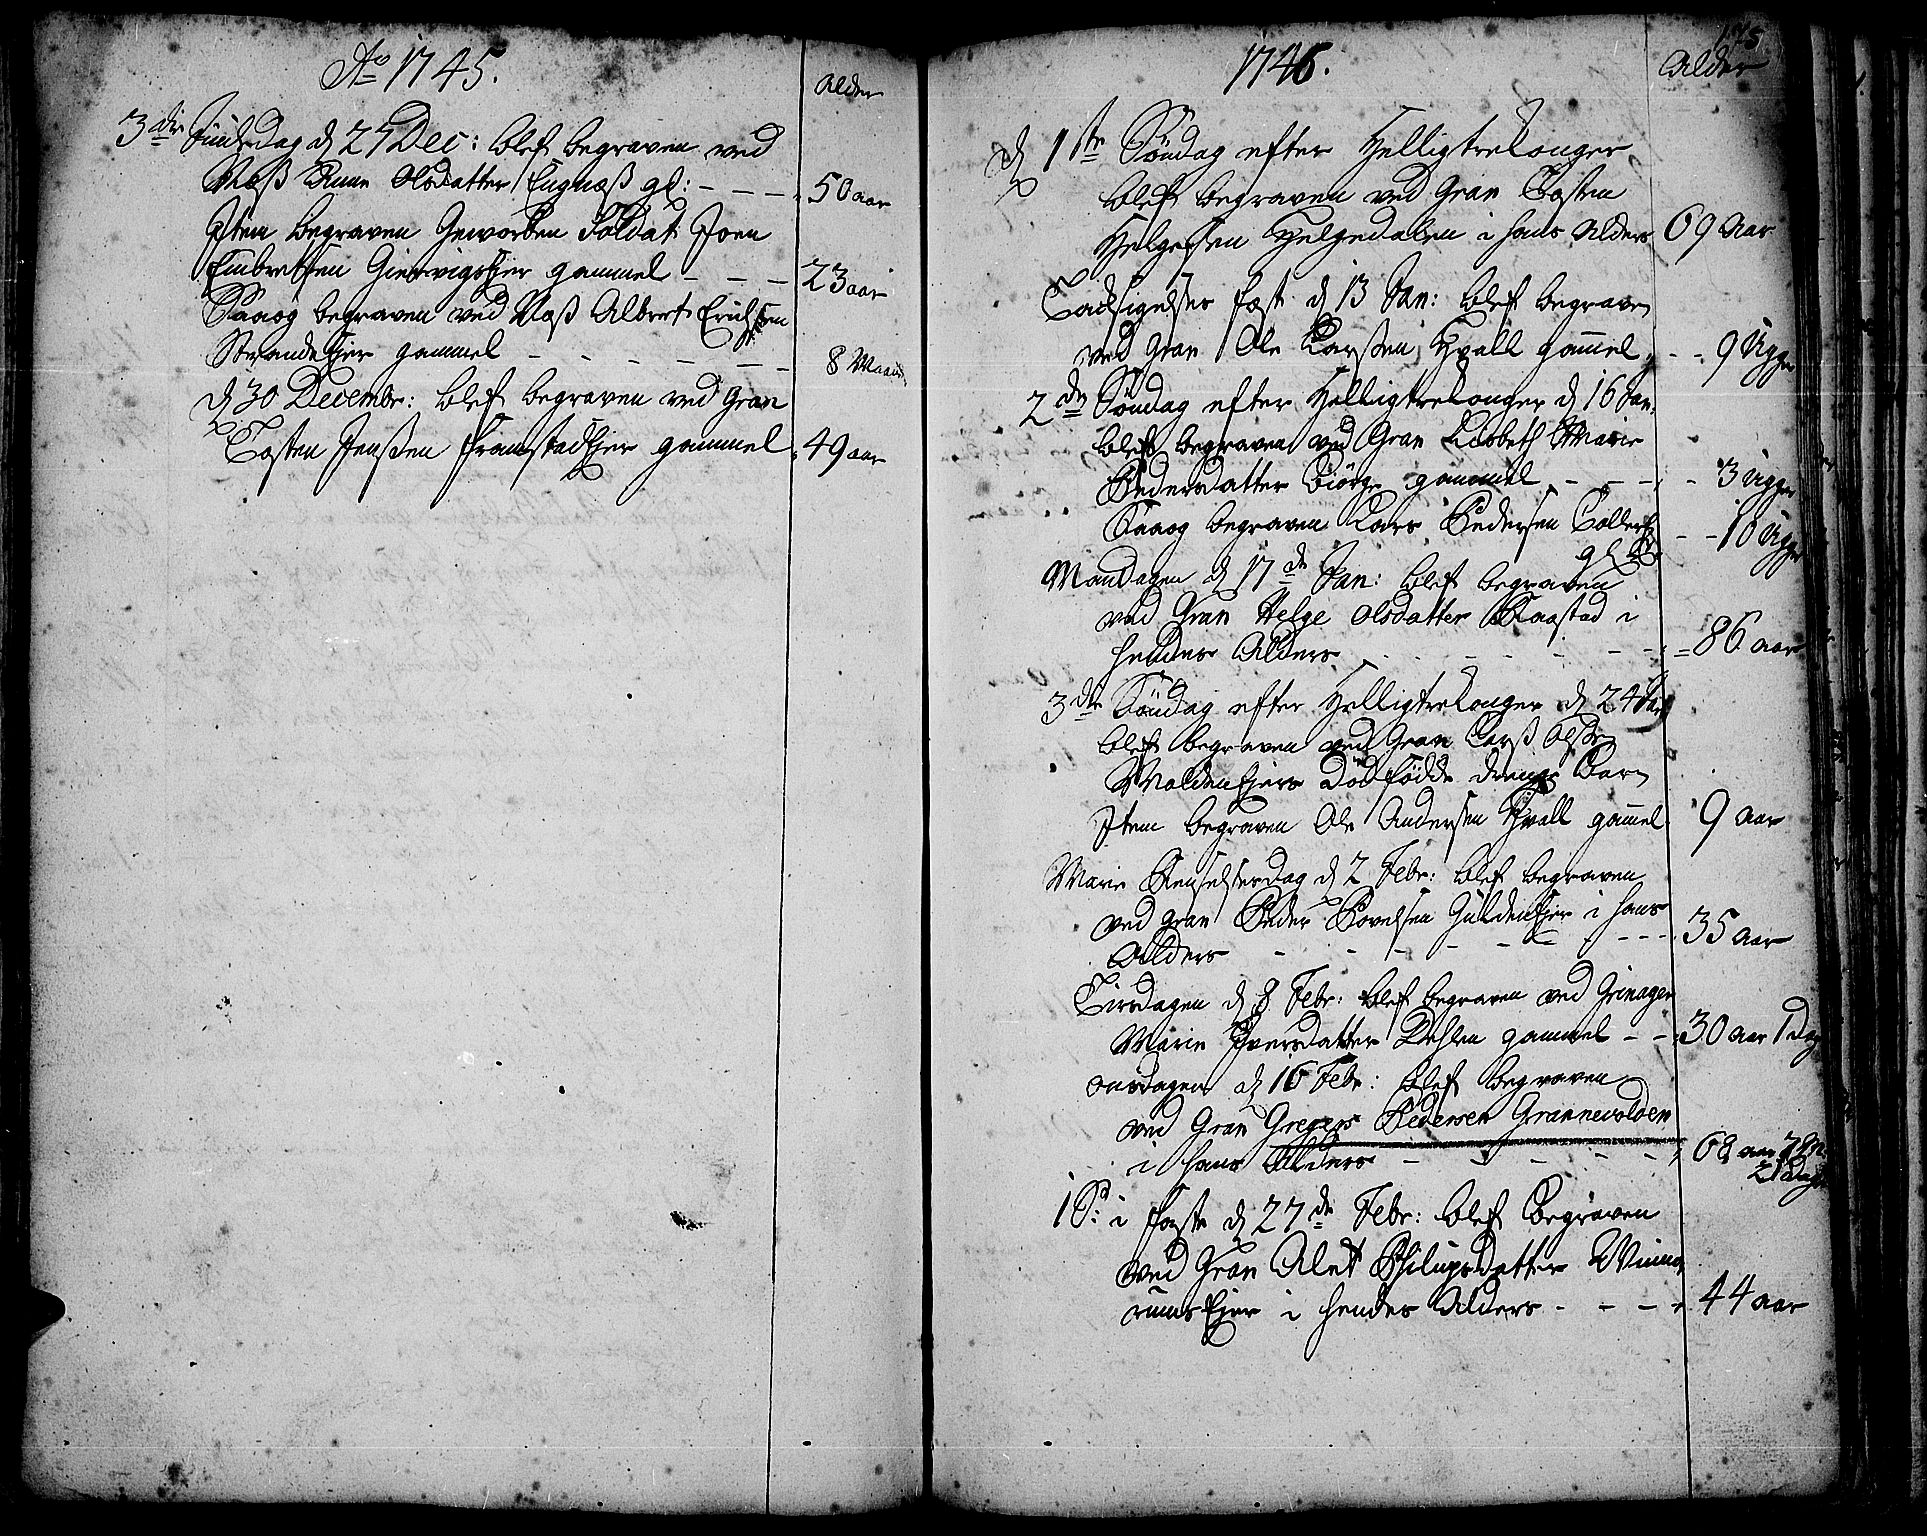 SAH, Gran prestekontor, Ministerialbok nr. 3, 1745-1758, s. 175